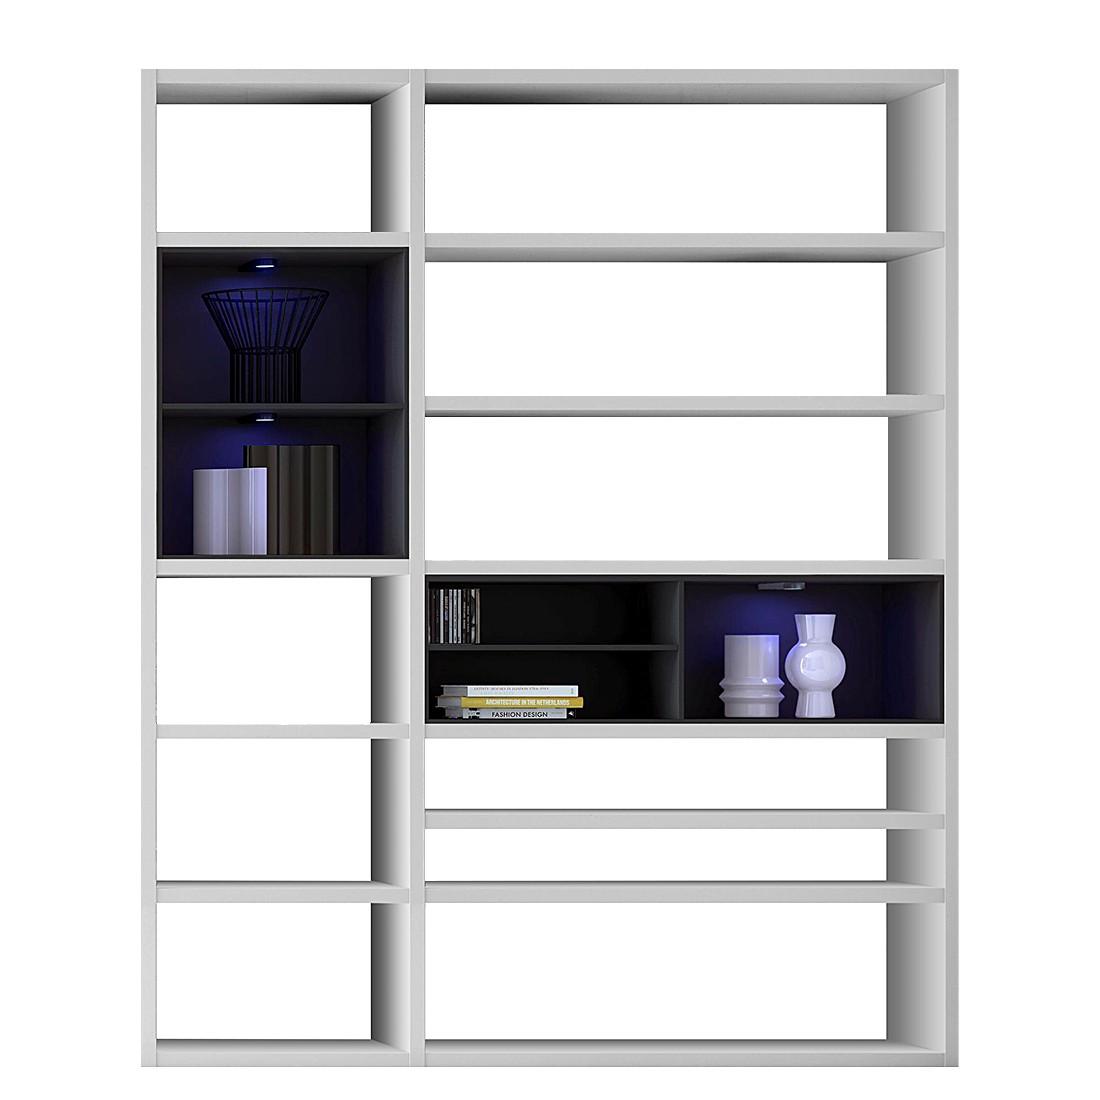 regalwand emporior ii b wei schwarz matt wei ohne beleuchtung. Black Bedroom Furniture Sets. Home Design Ideas